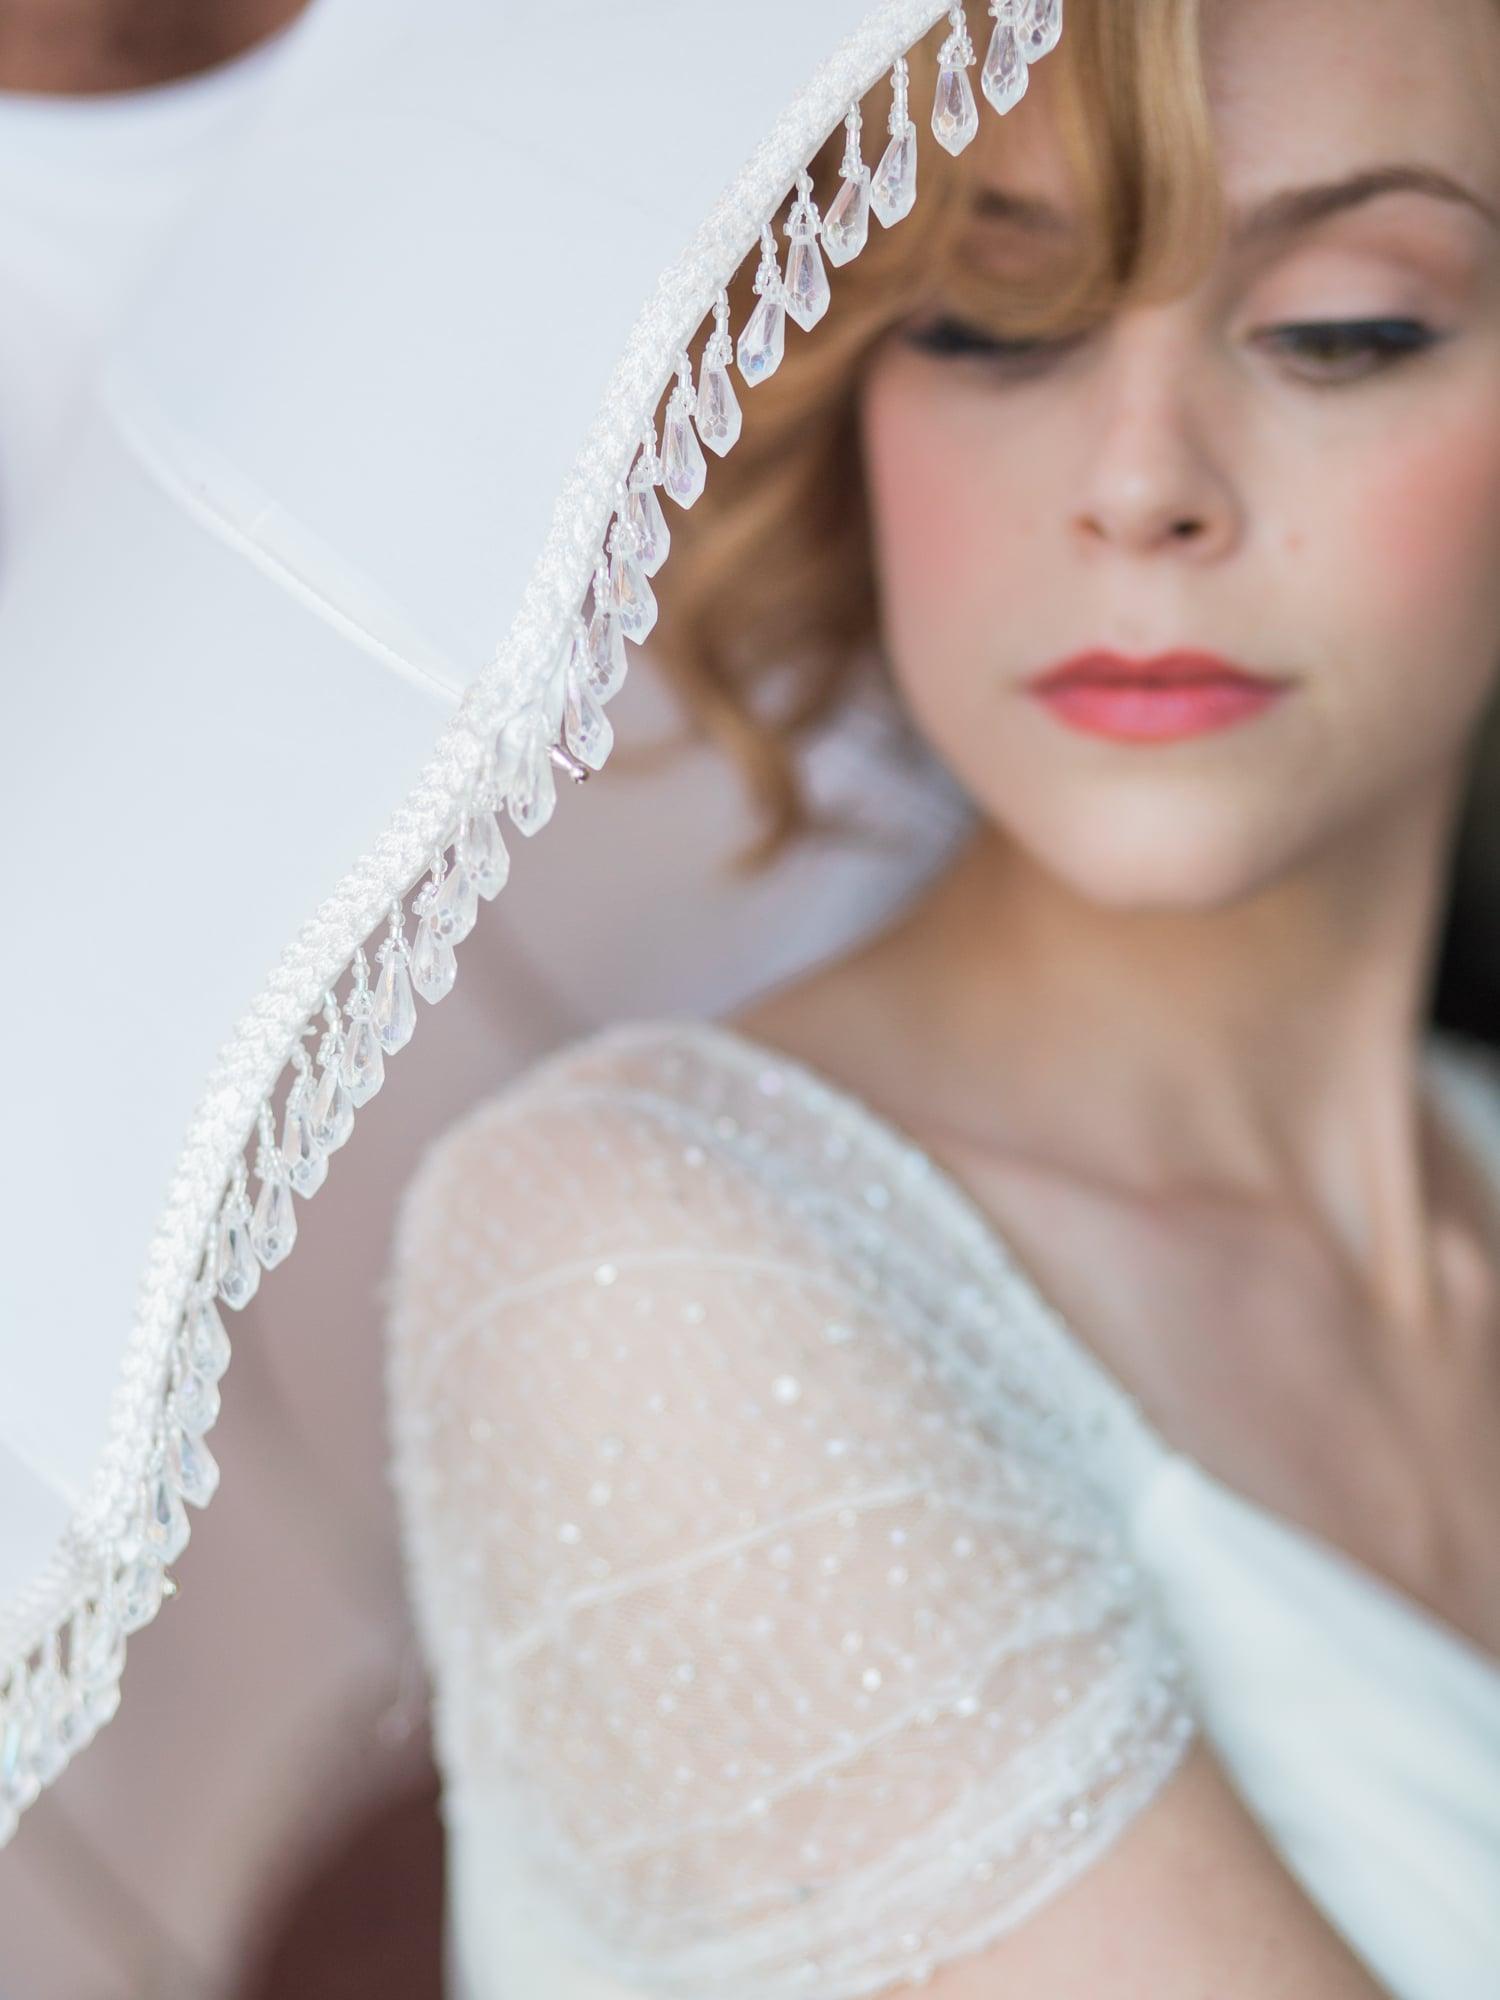 Bella Umbrella Vintage Umbrellas for Rent | Alante Photography | Seattle Wedding Planning